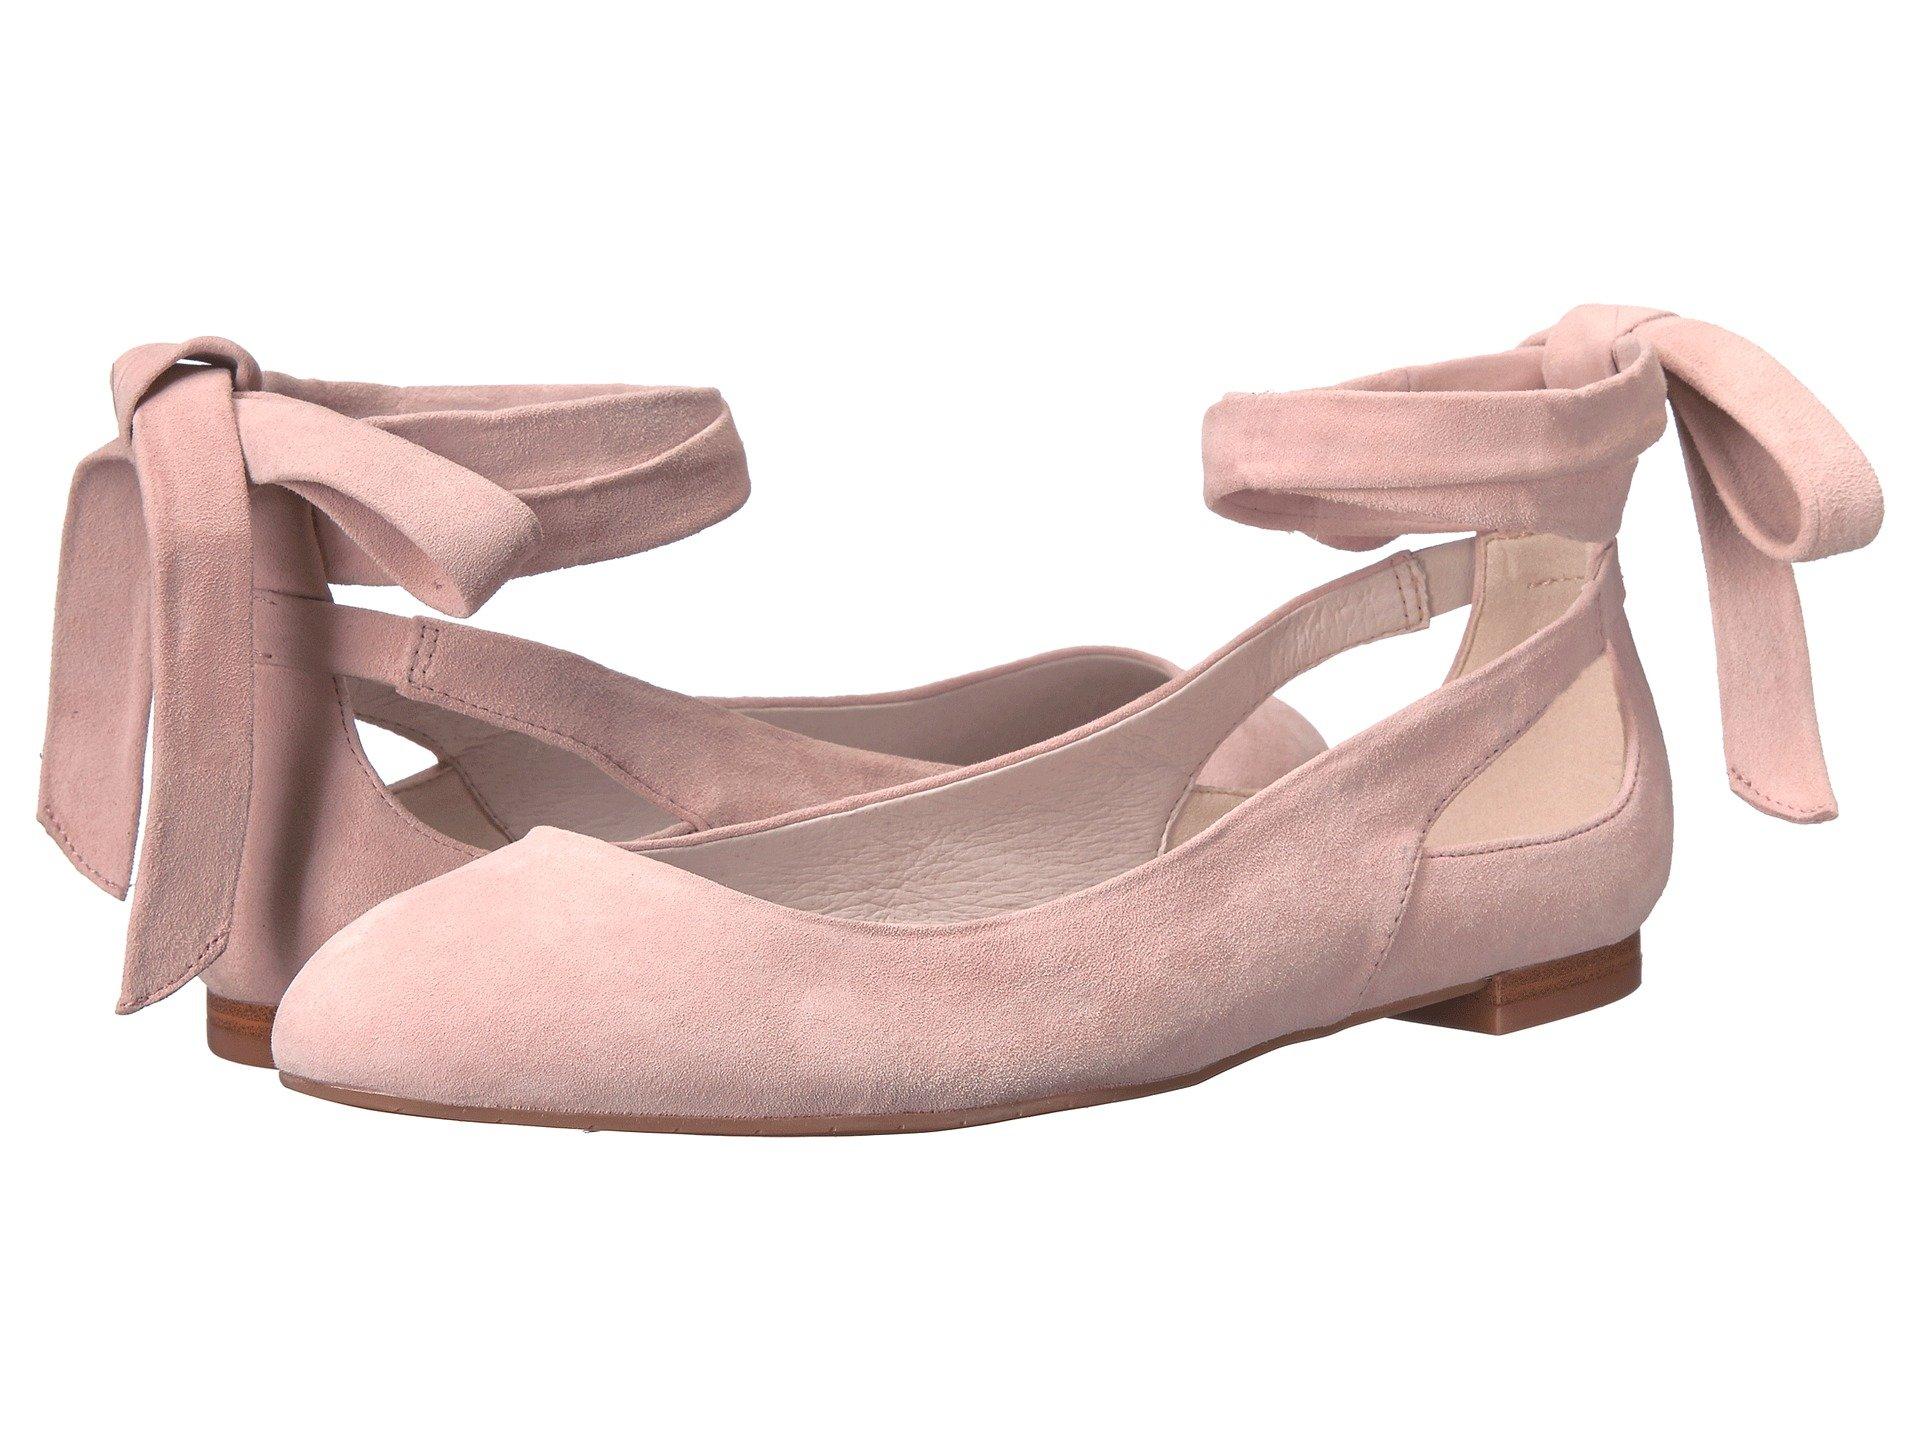 Baletas para Mujer Kenneth Cole New York Wilhelmina  + Kenneth Cole en VeoyCompro.net